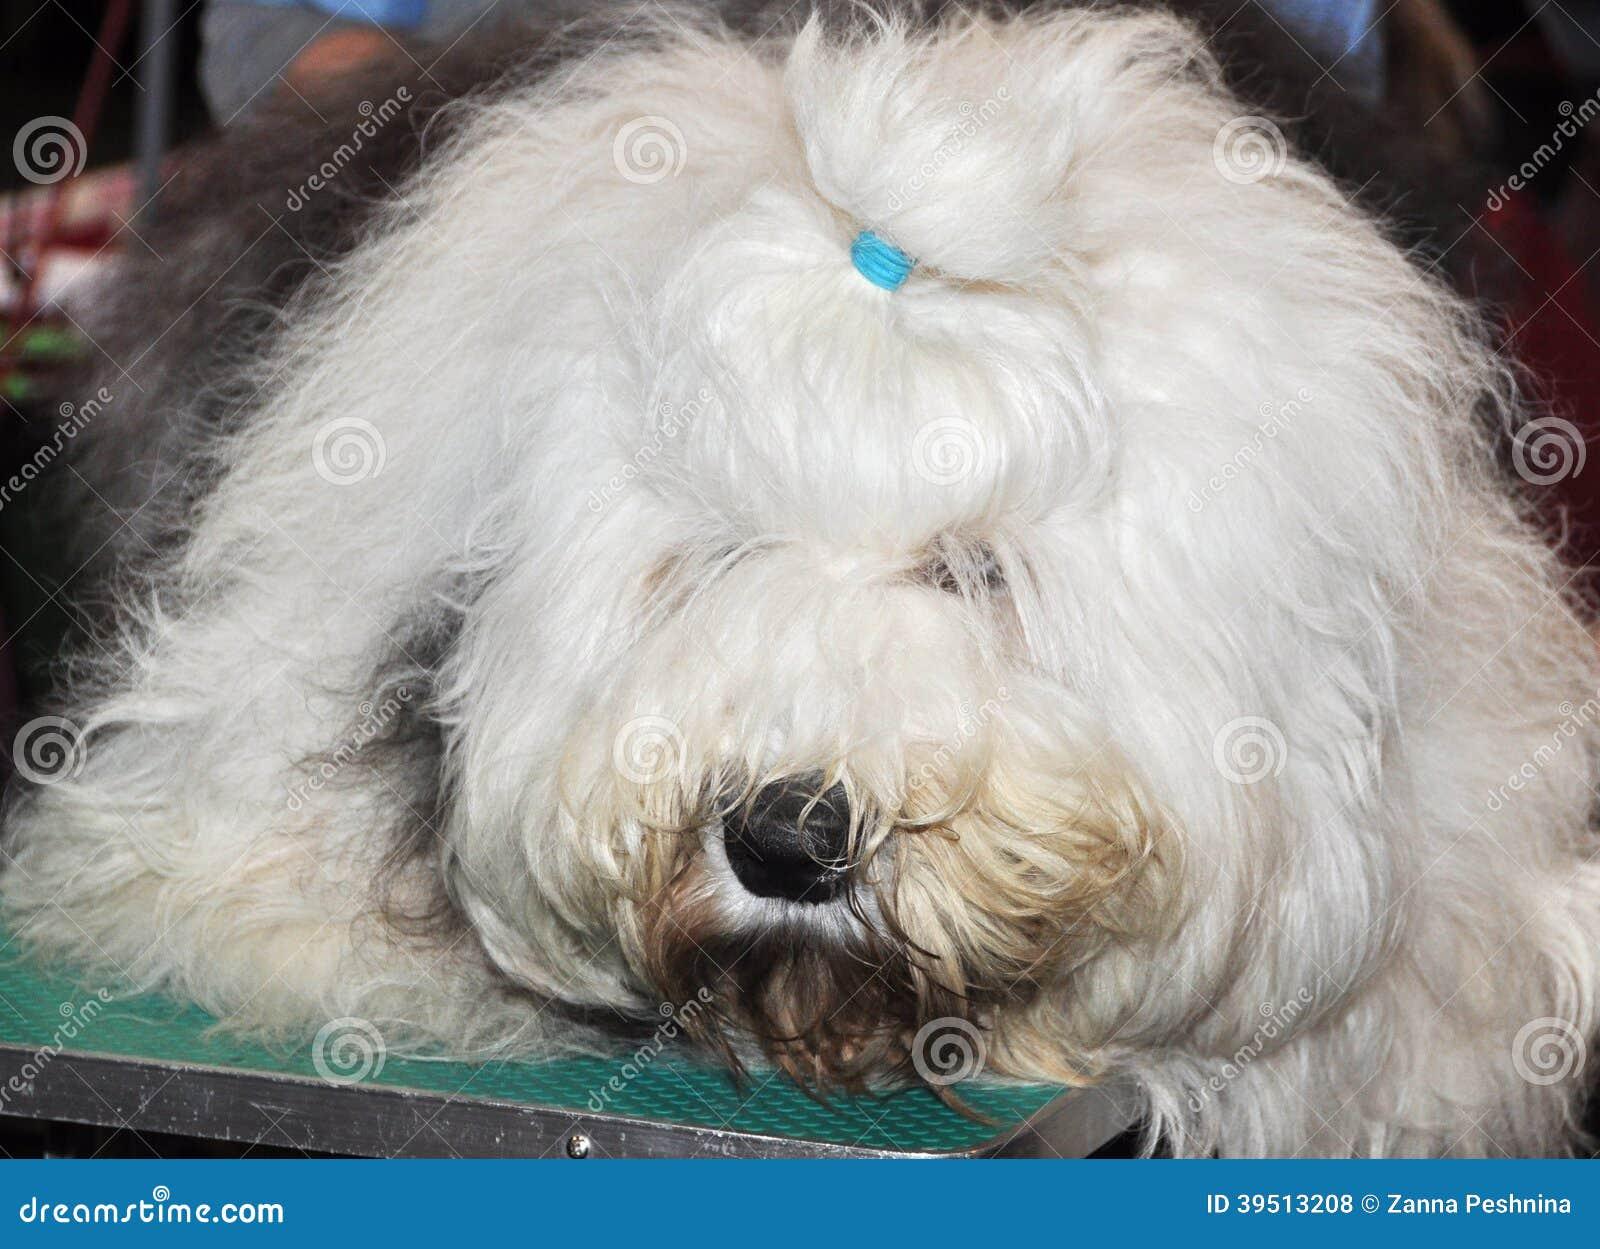 English Sheepdog